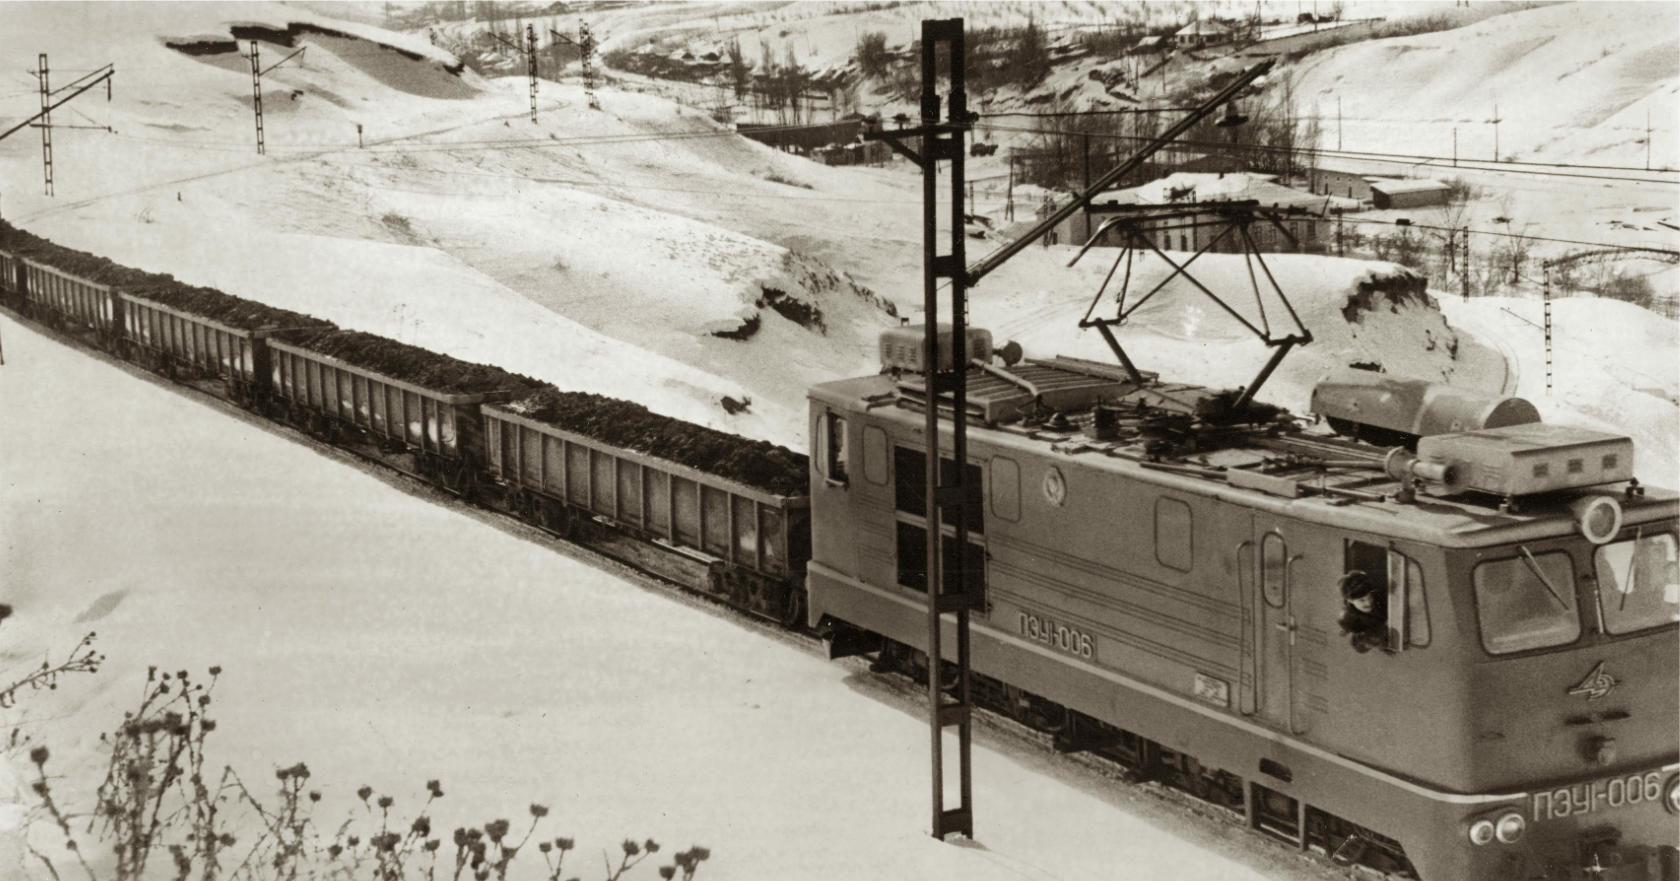 Железнодорожный цех. Доставка руды на фабрику. (альбом ТСЦК 1974 года).jpg